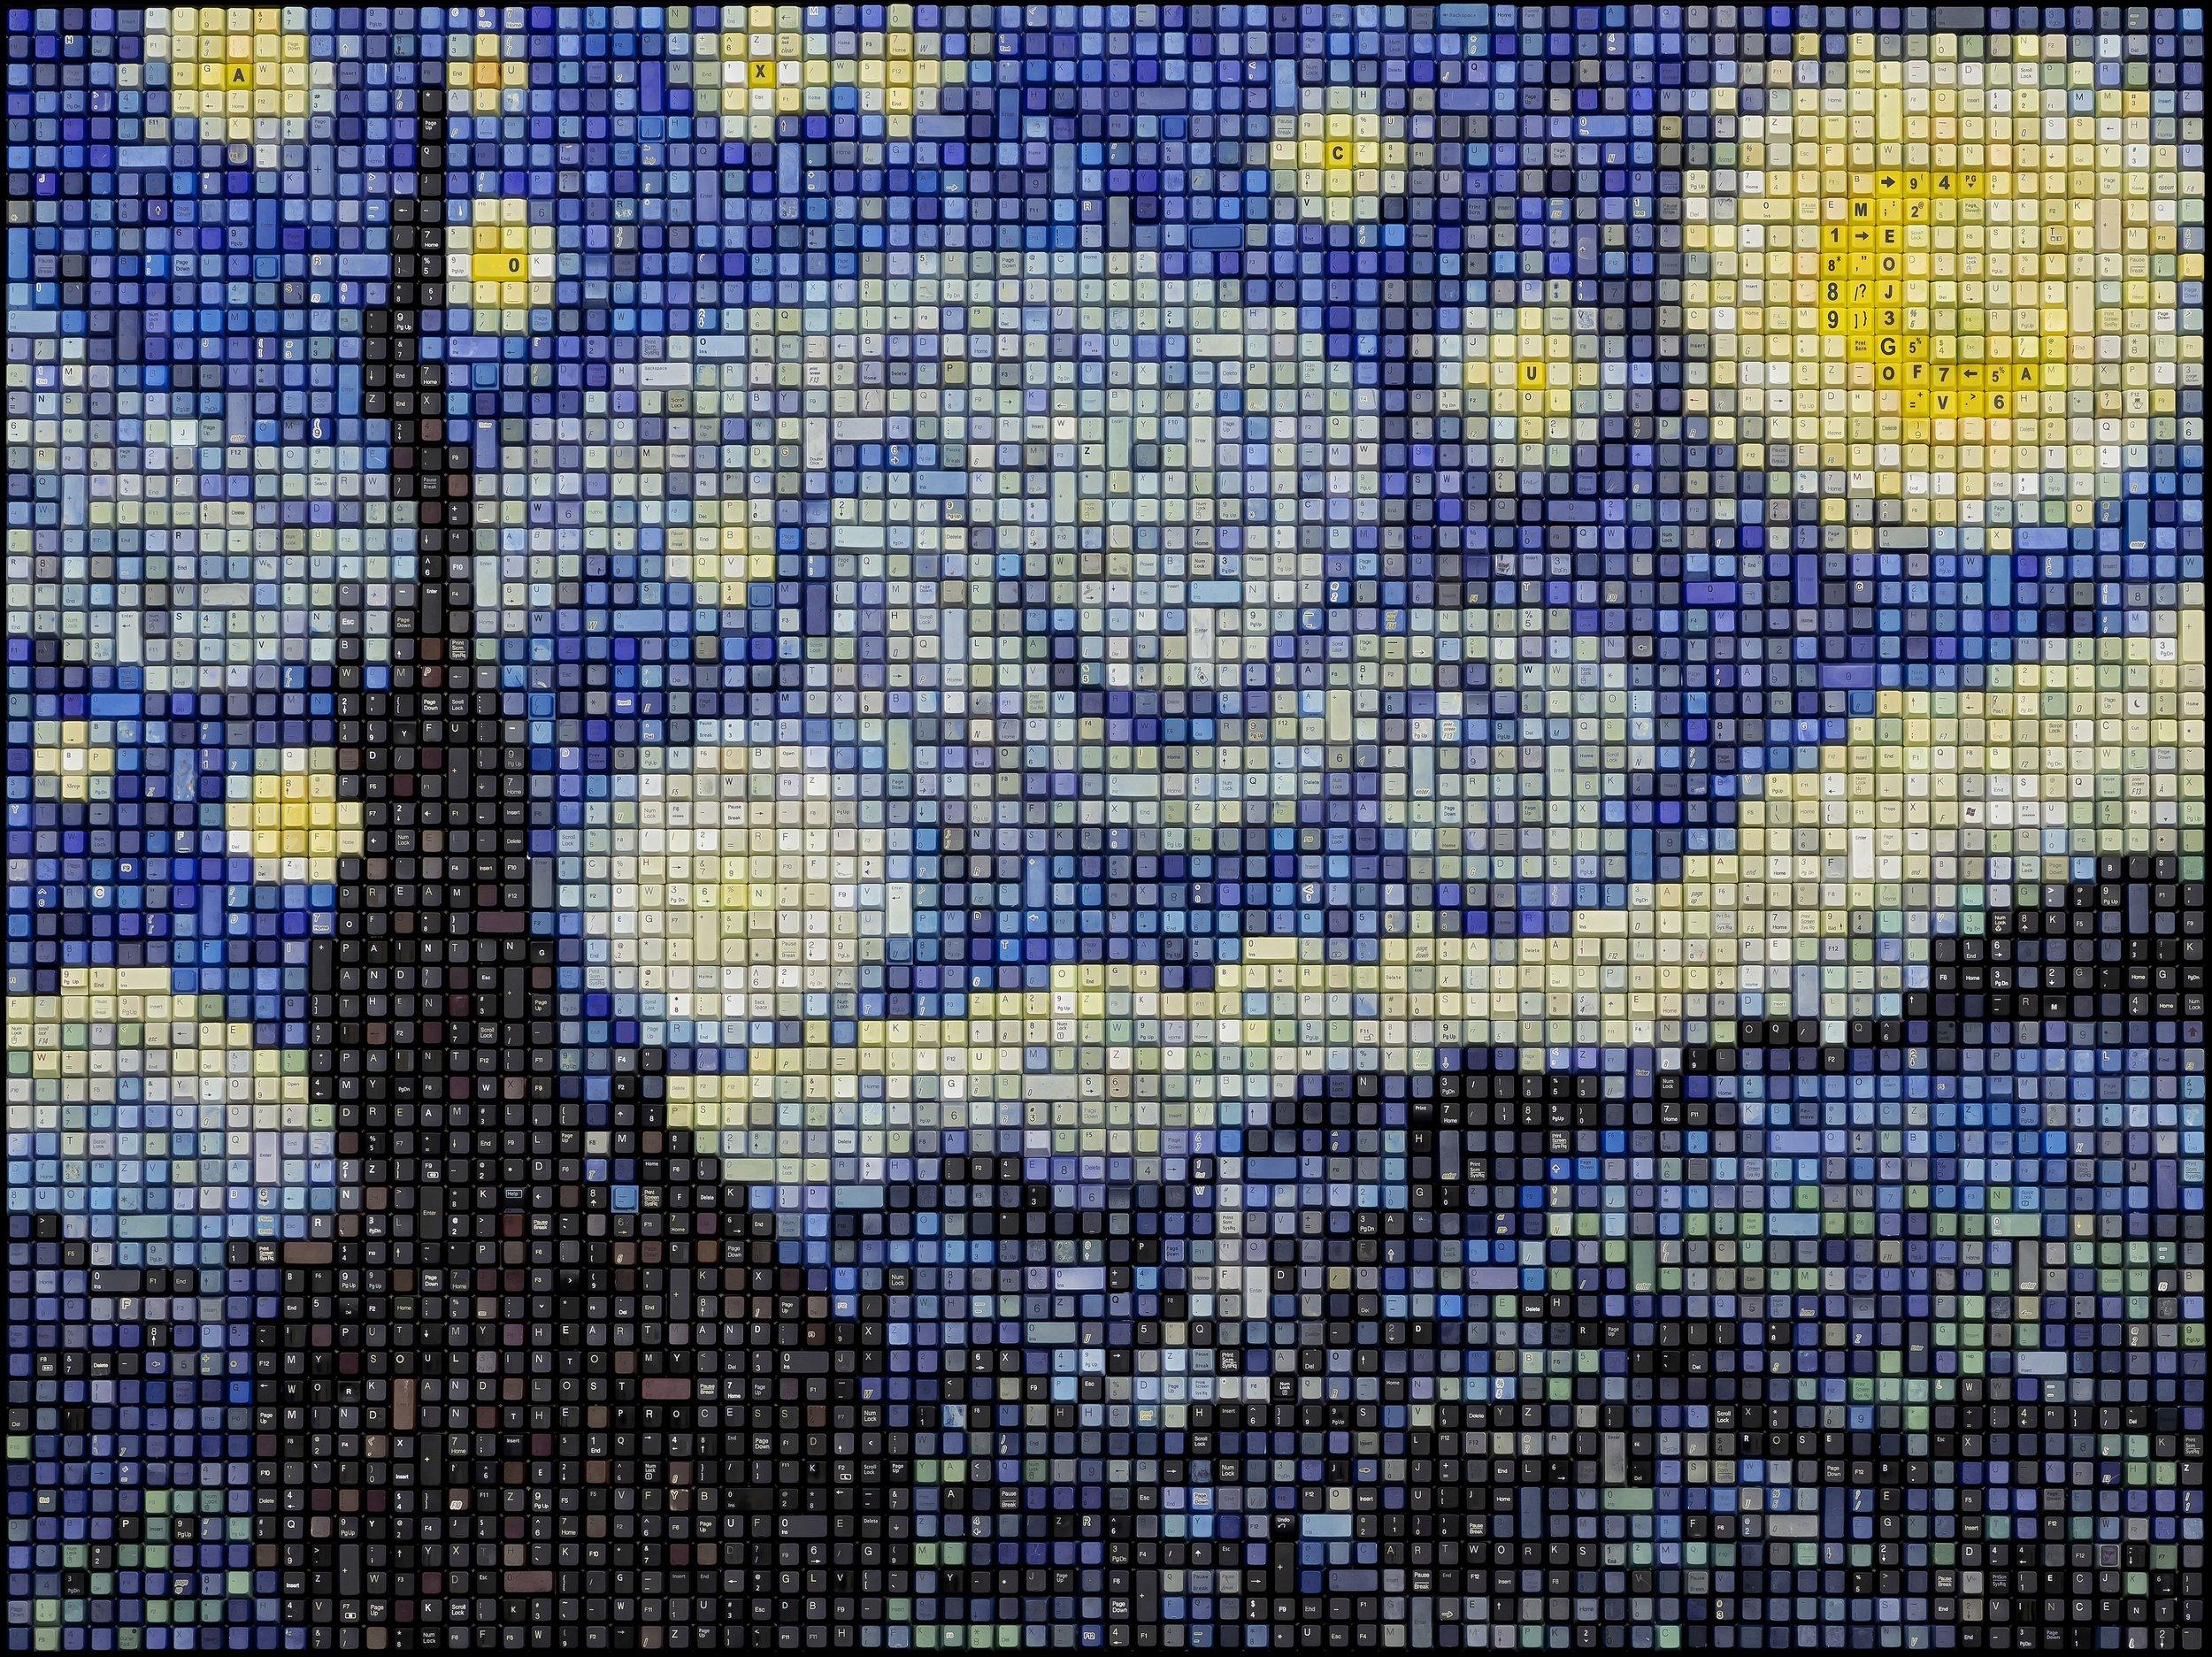 STARRY NIGHT  | 44 X 57 in   ORIGINAL  |  PRINTS